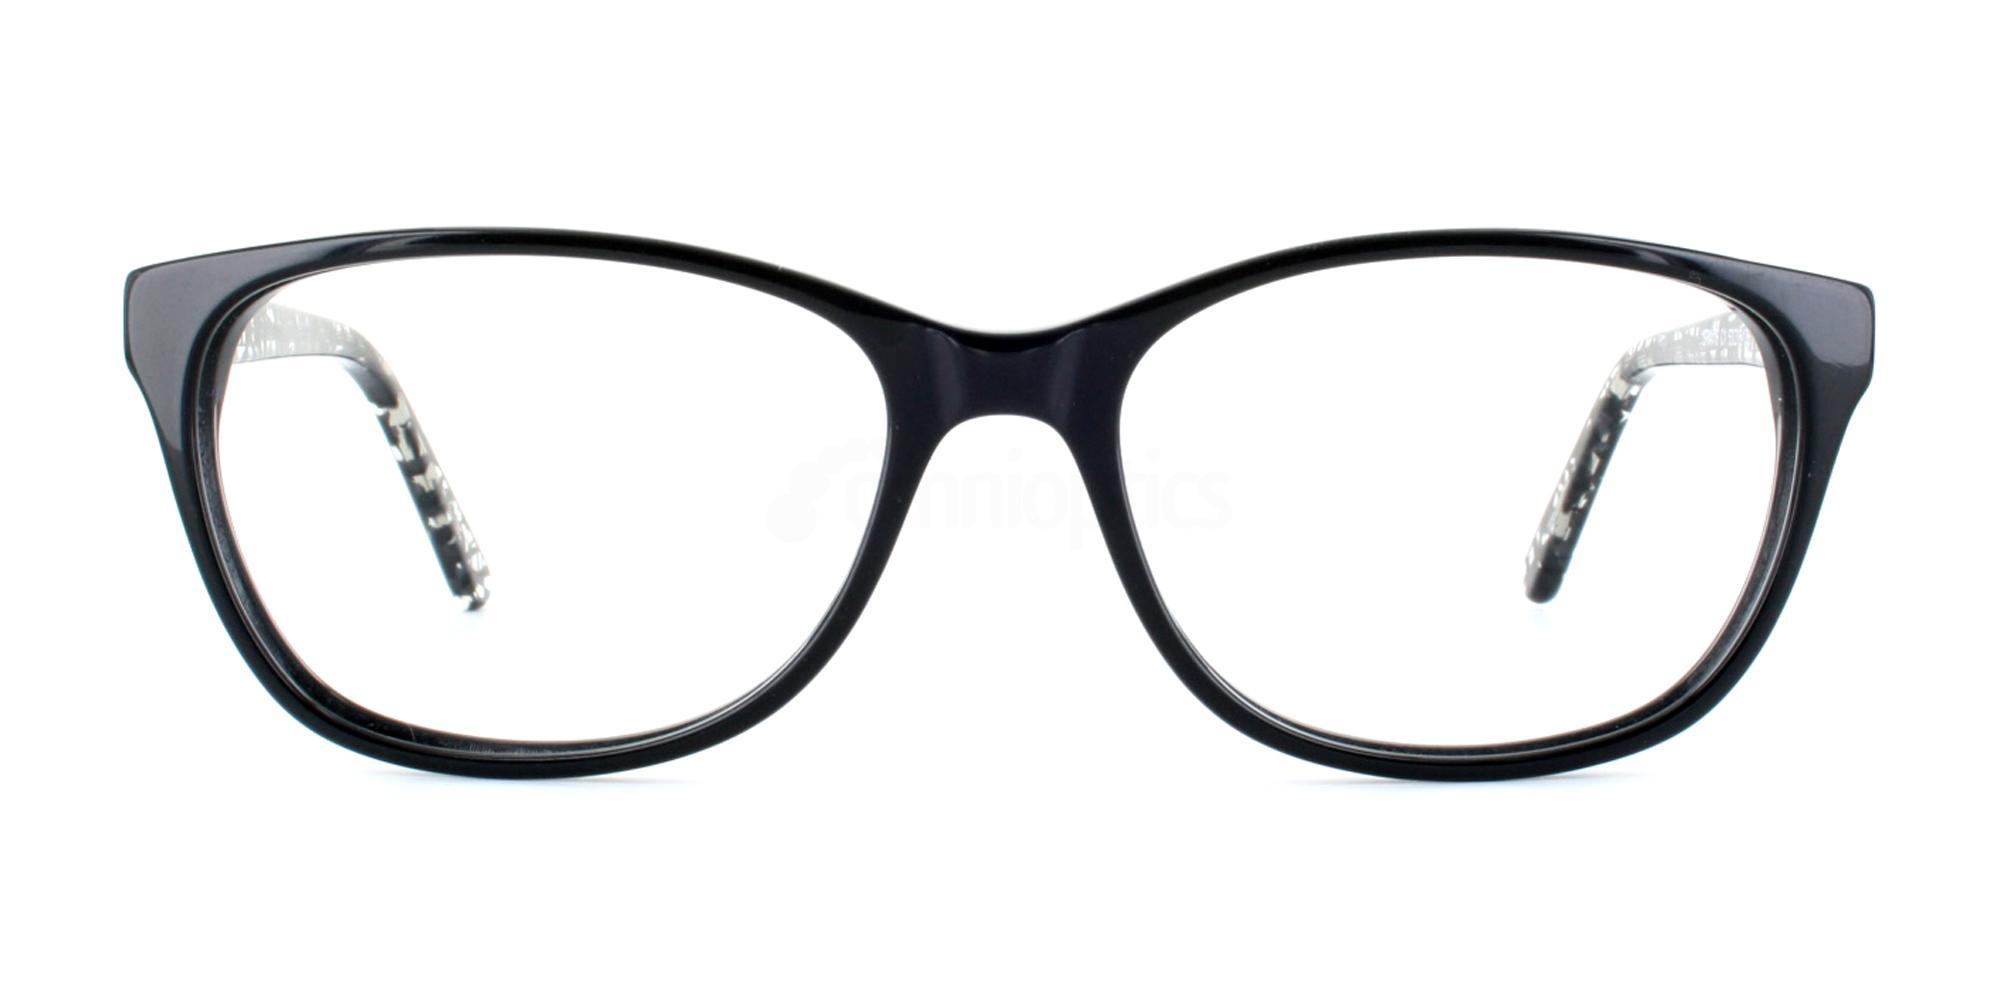 C1 SRA116 Glasses, SelectSpecs